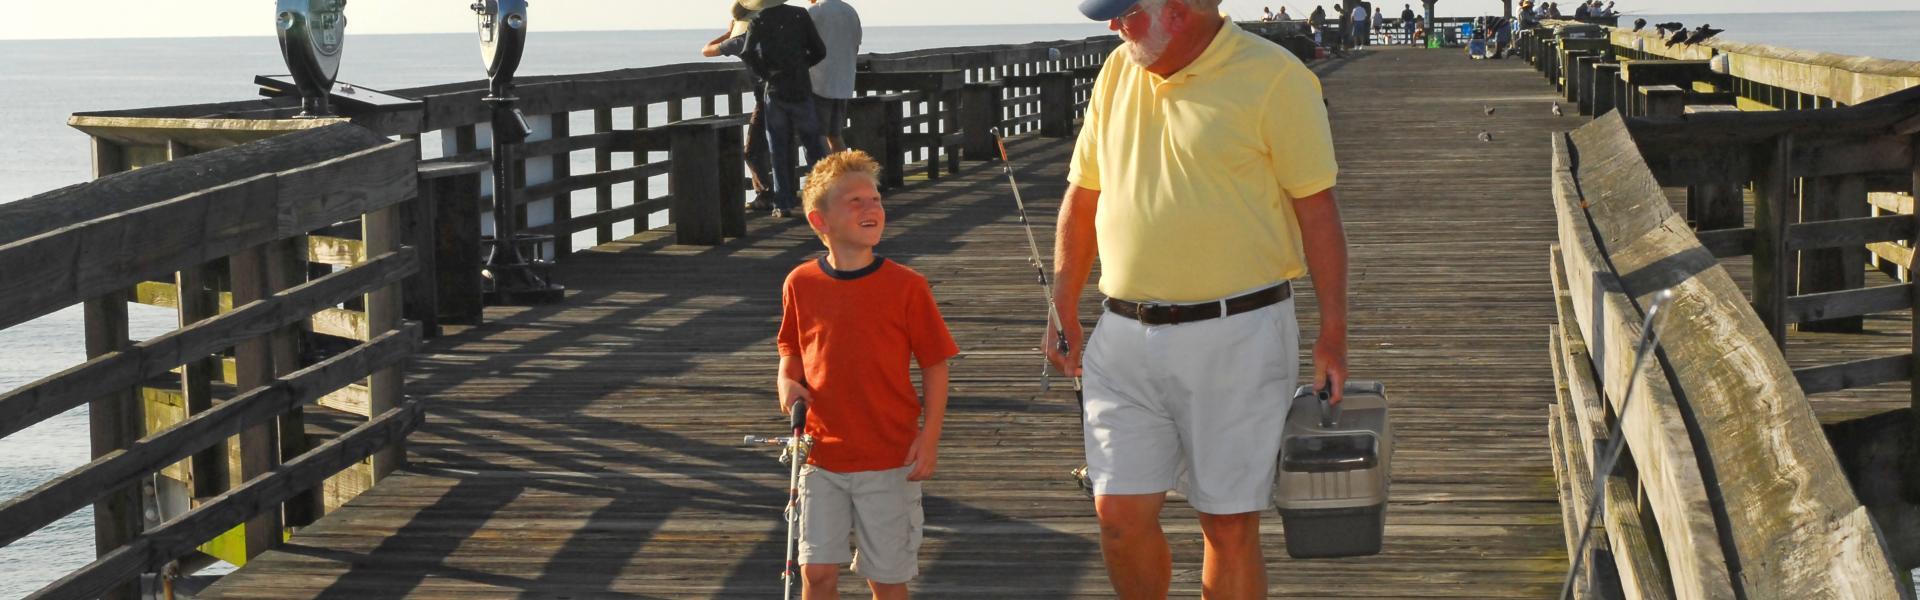 Top Reasons to Retire in Myrtle Beach   Visit Myrtle Beach